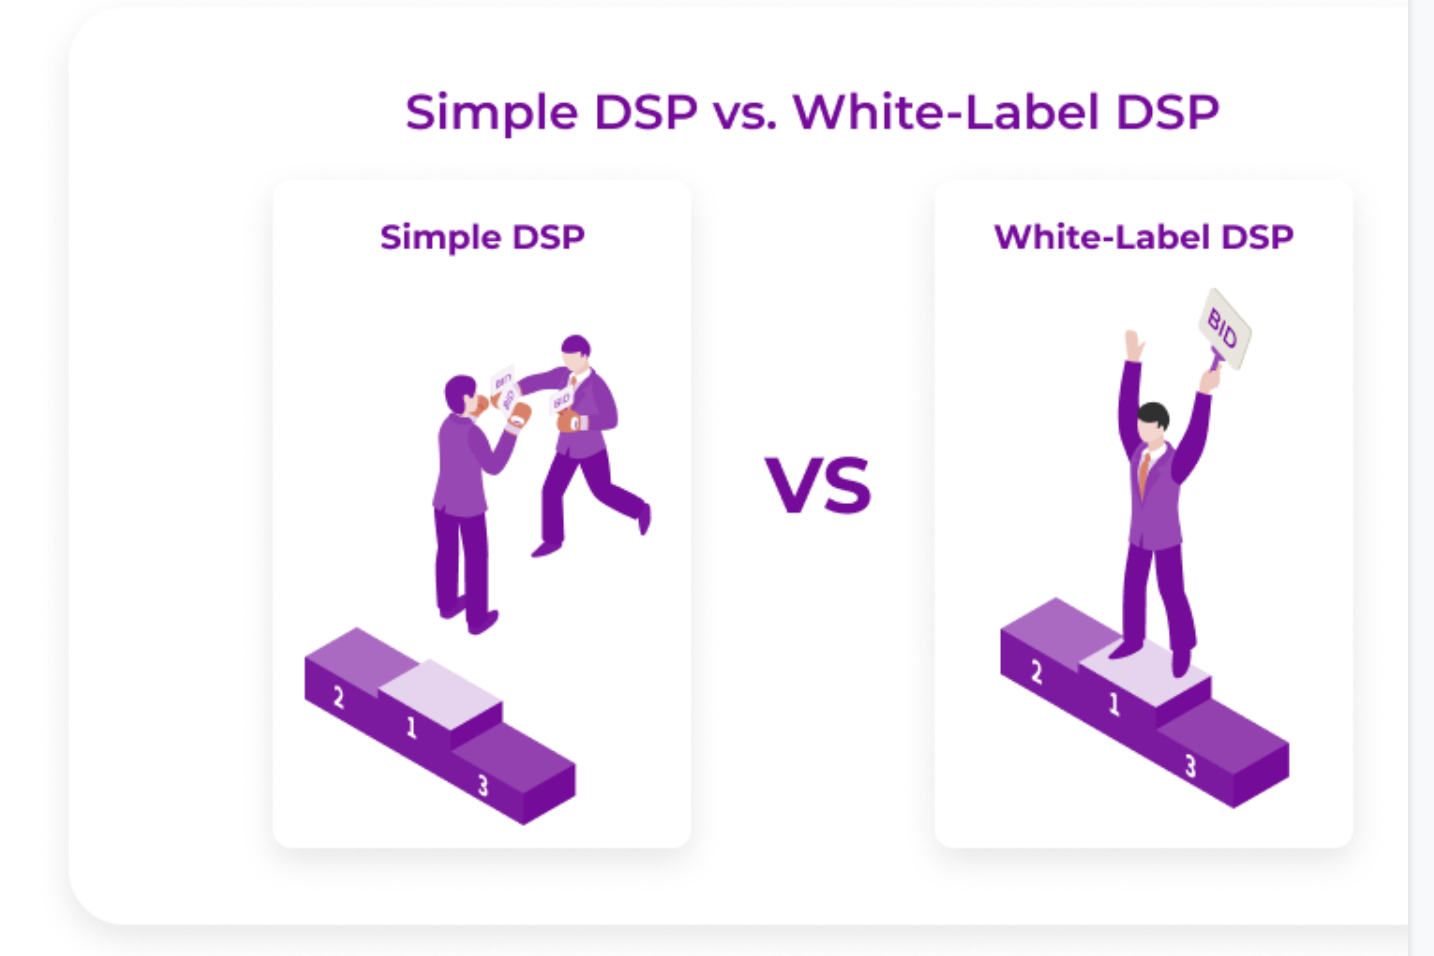 Whitel label dsp vs Simple DSP